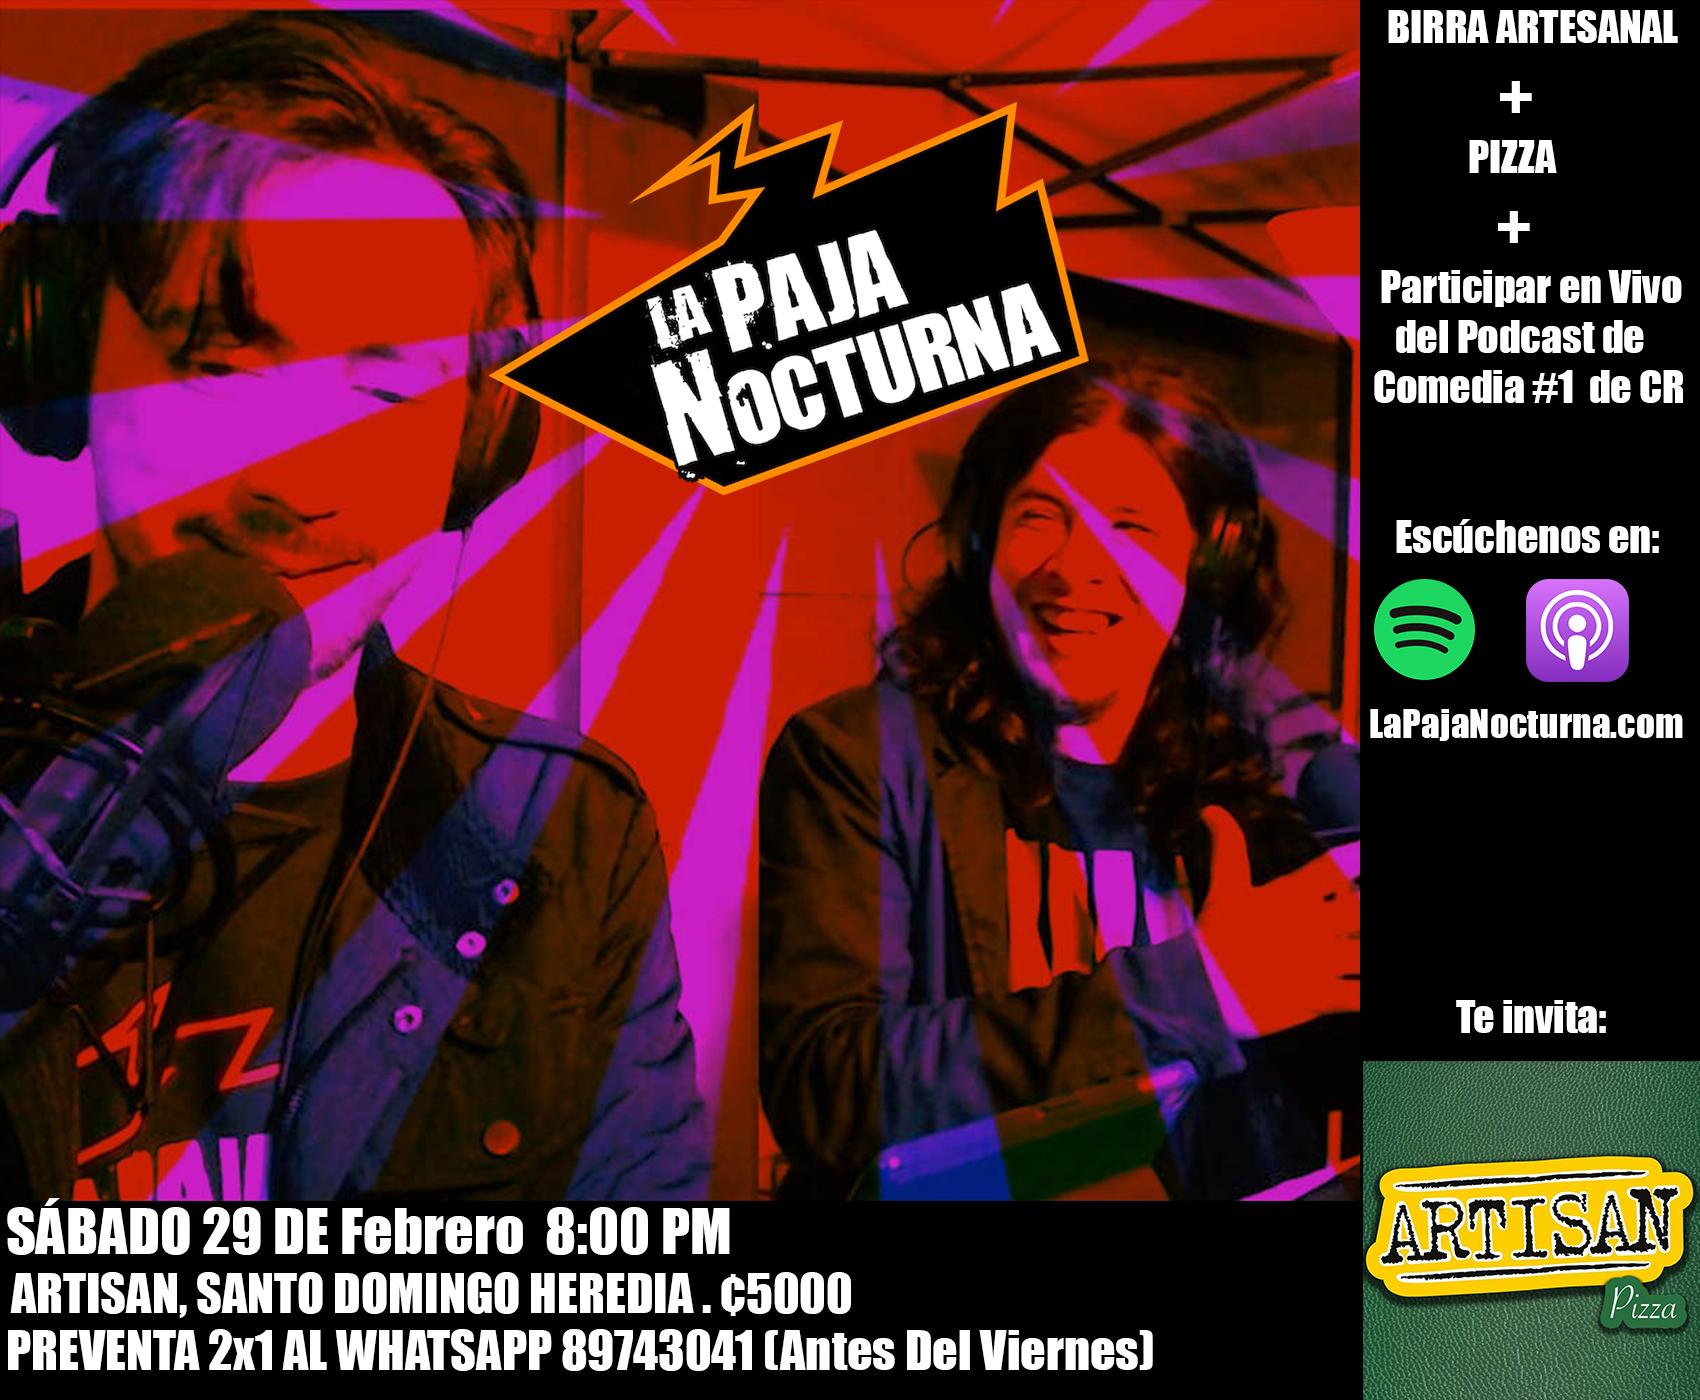 La Paja Nocturna Podcast 15 de Febrero en vivo